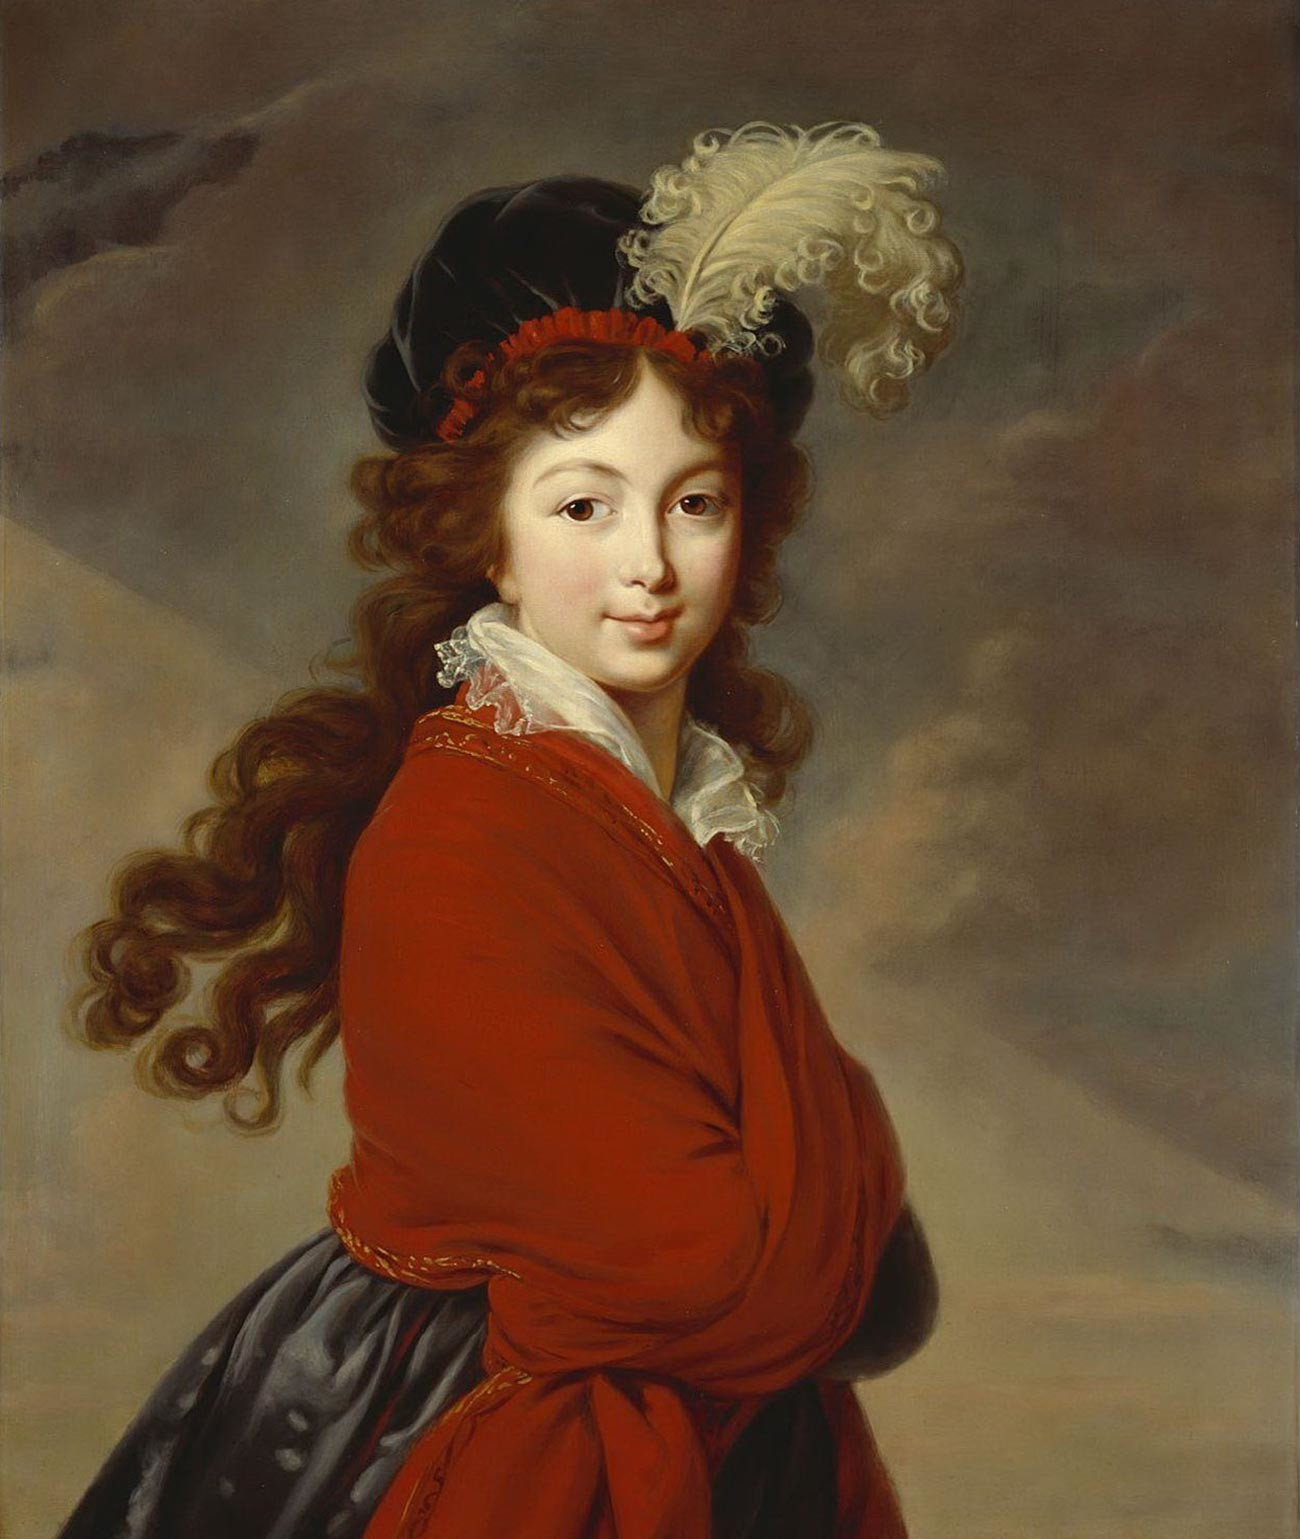 Julienne de Saxe-Cobourg-Saalfeld